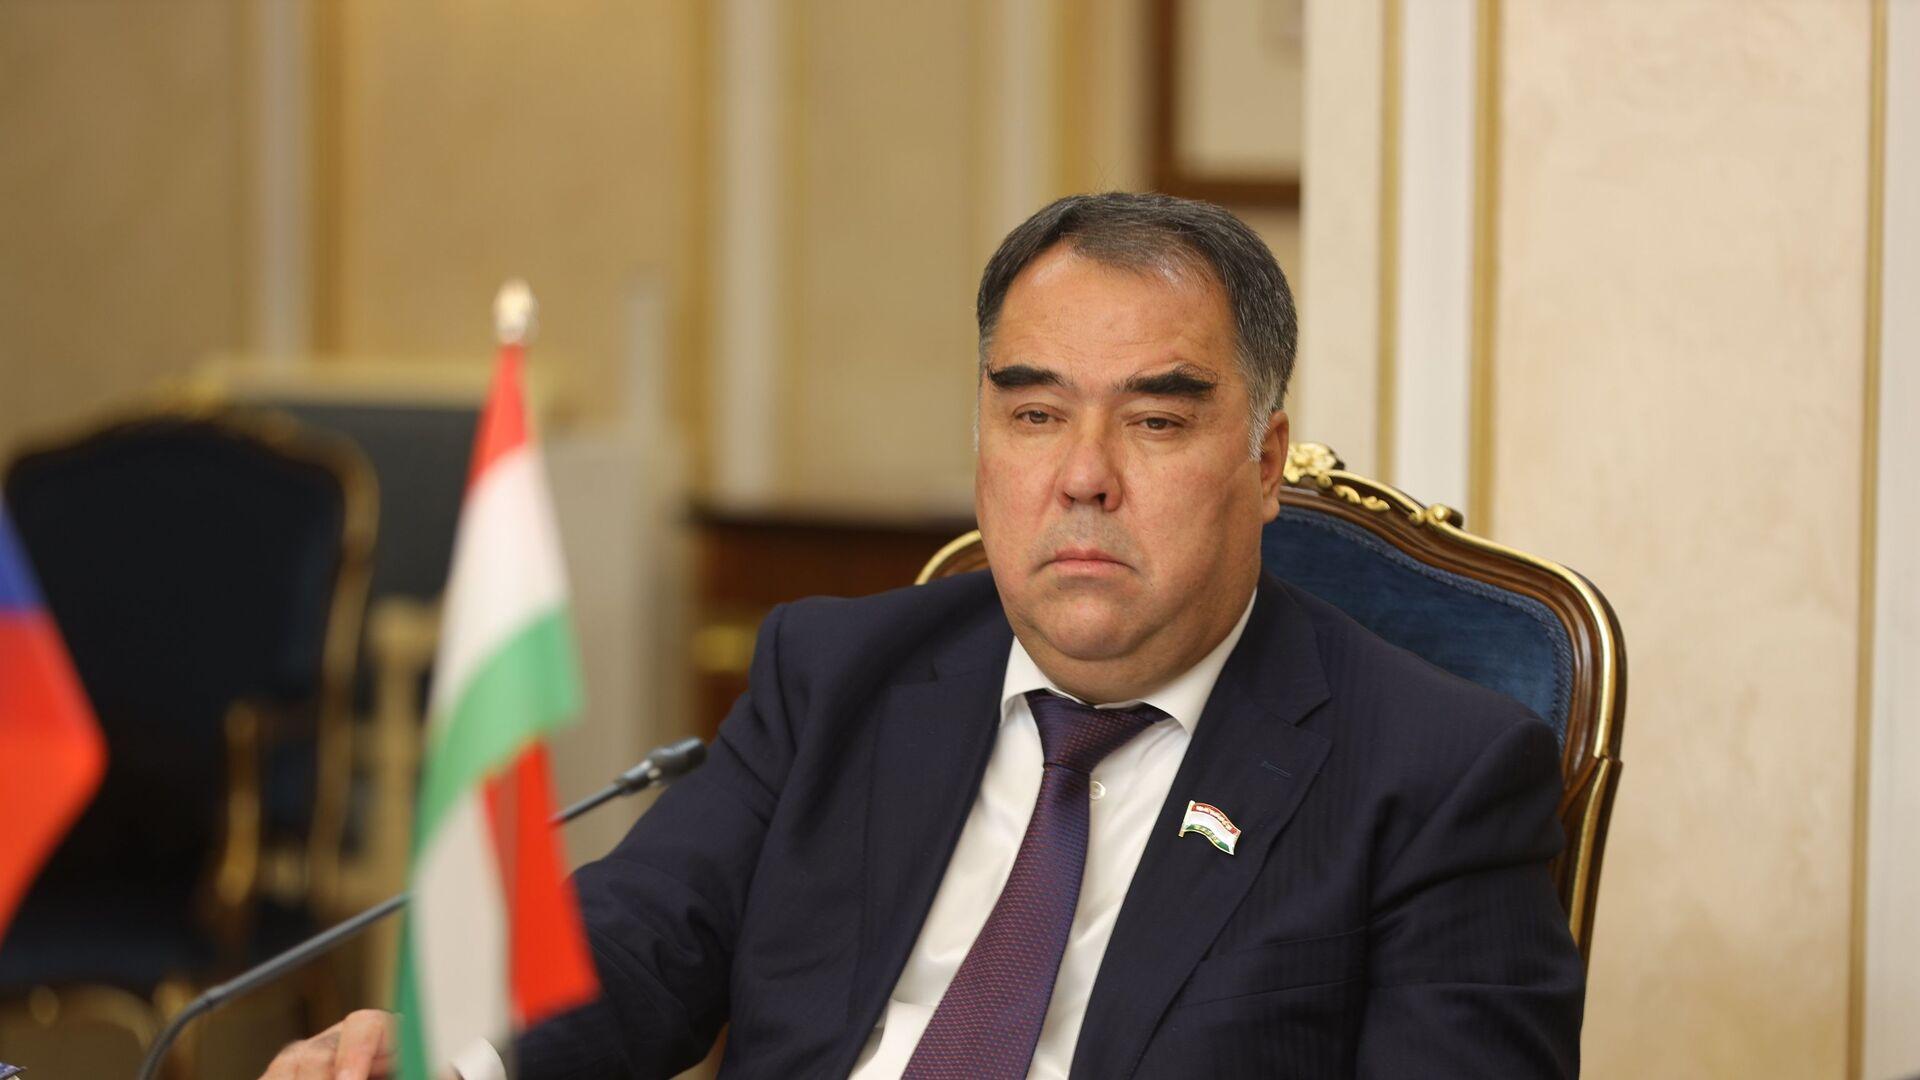 Председатель области Раджаббой Ахмадзода  - Sputnik Таджикистан, 1920, 16.06.2021